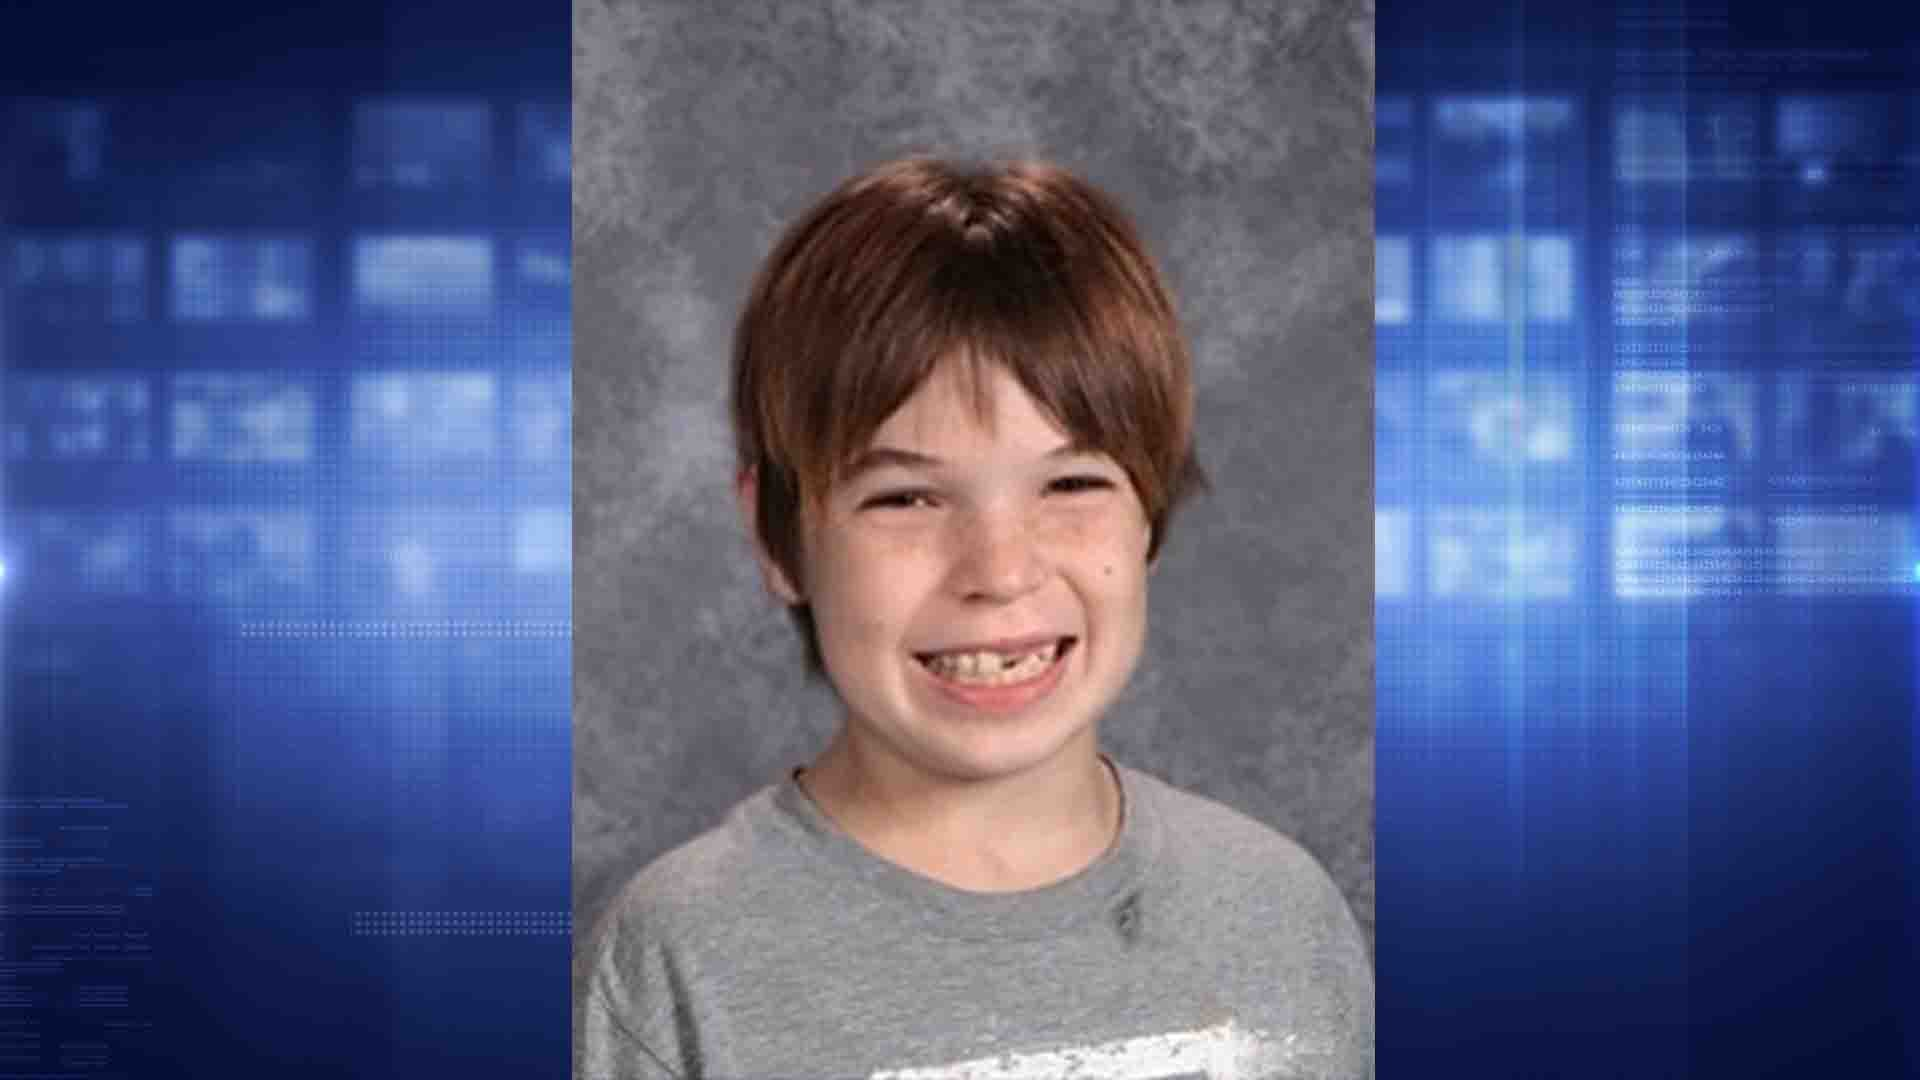 Police in Pekin, Illinois say Robert Bee was last seen on November 11. (ISP)